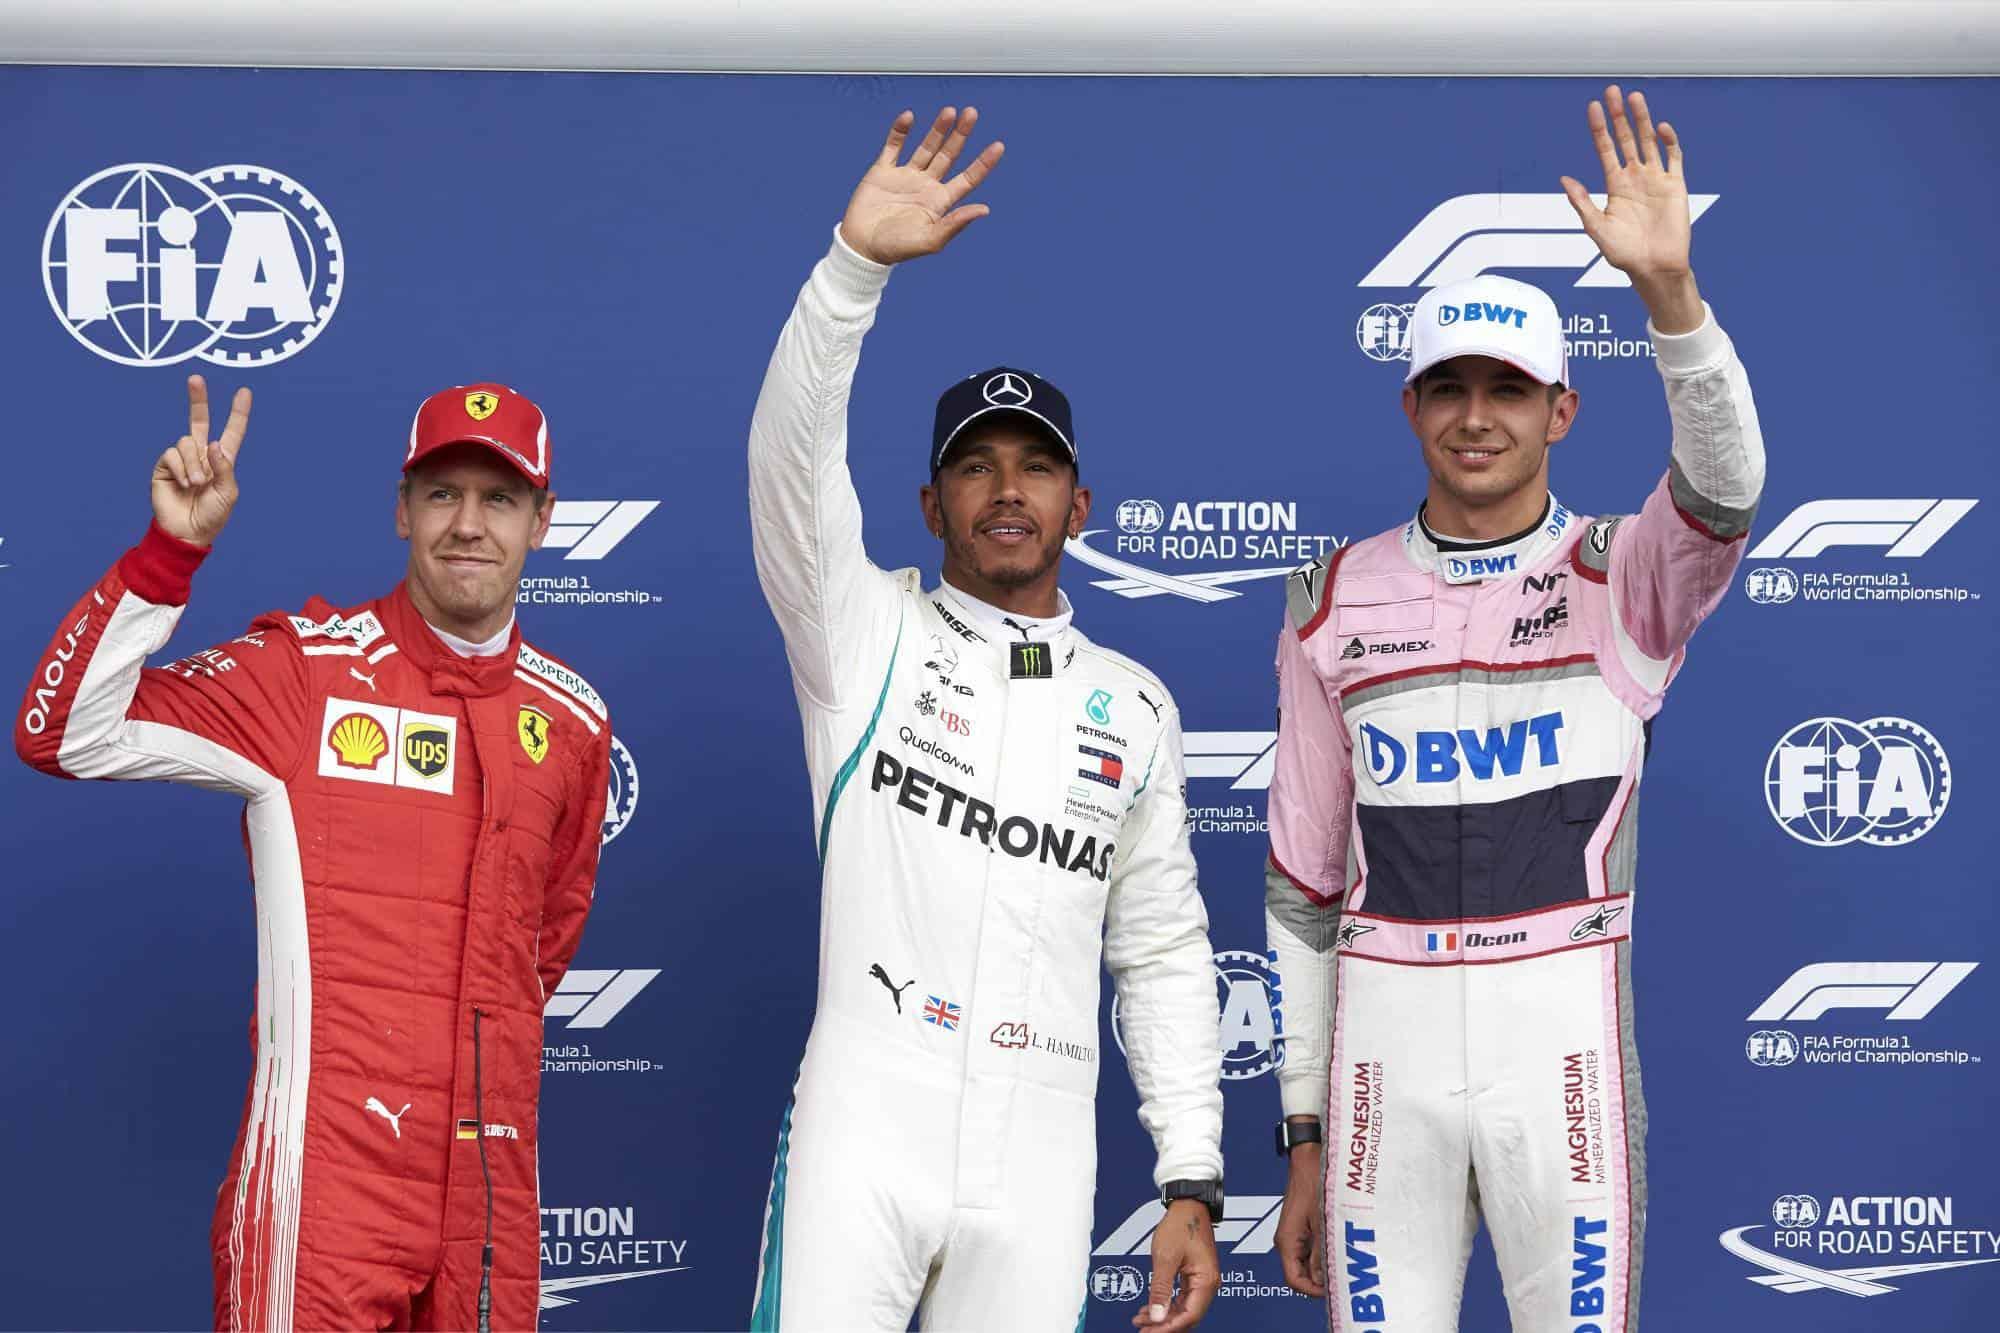 Hamilton Vettel Ocon Belgian GP F1 2018 Photo Daimler